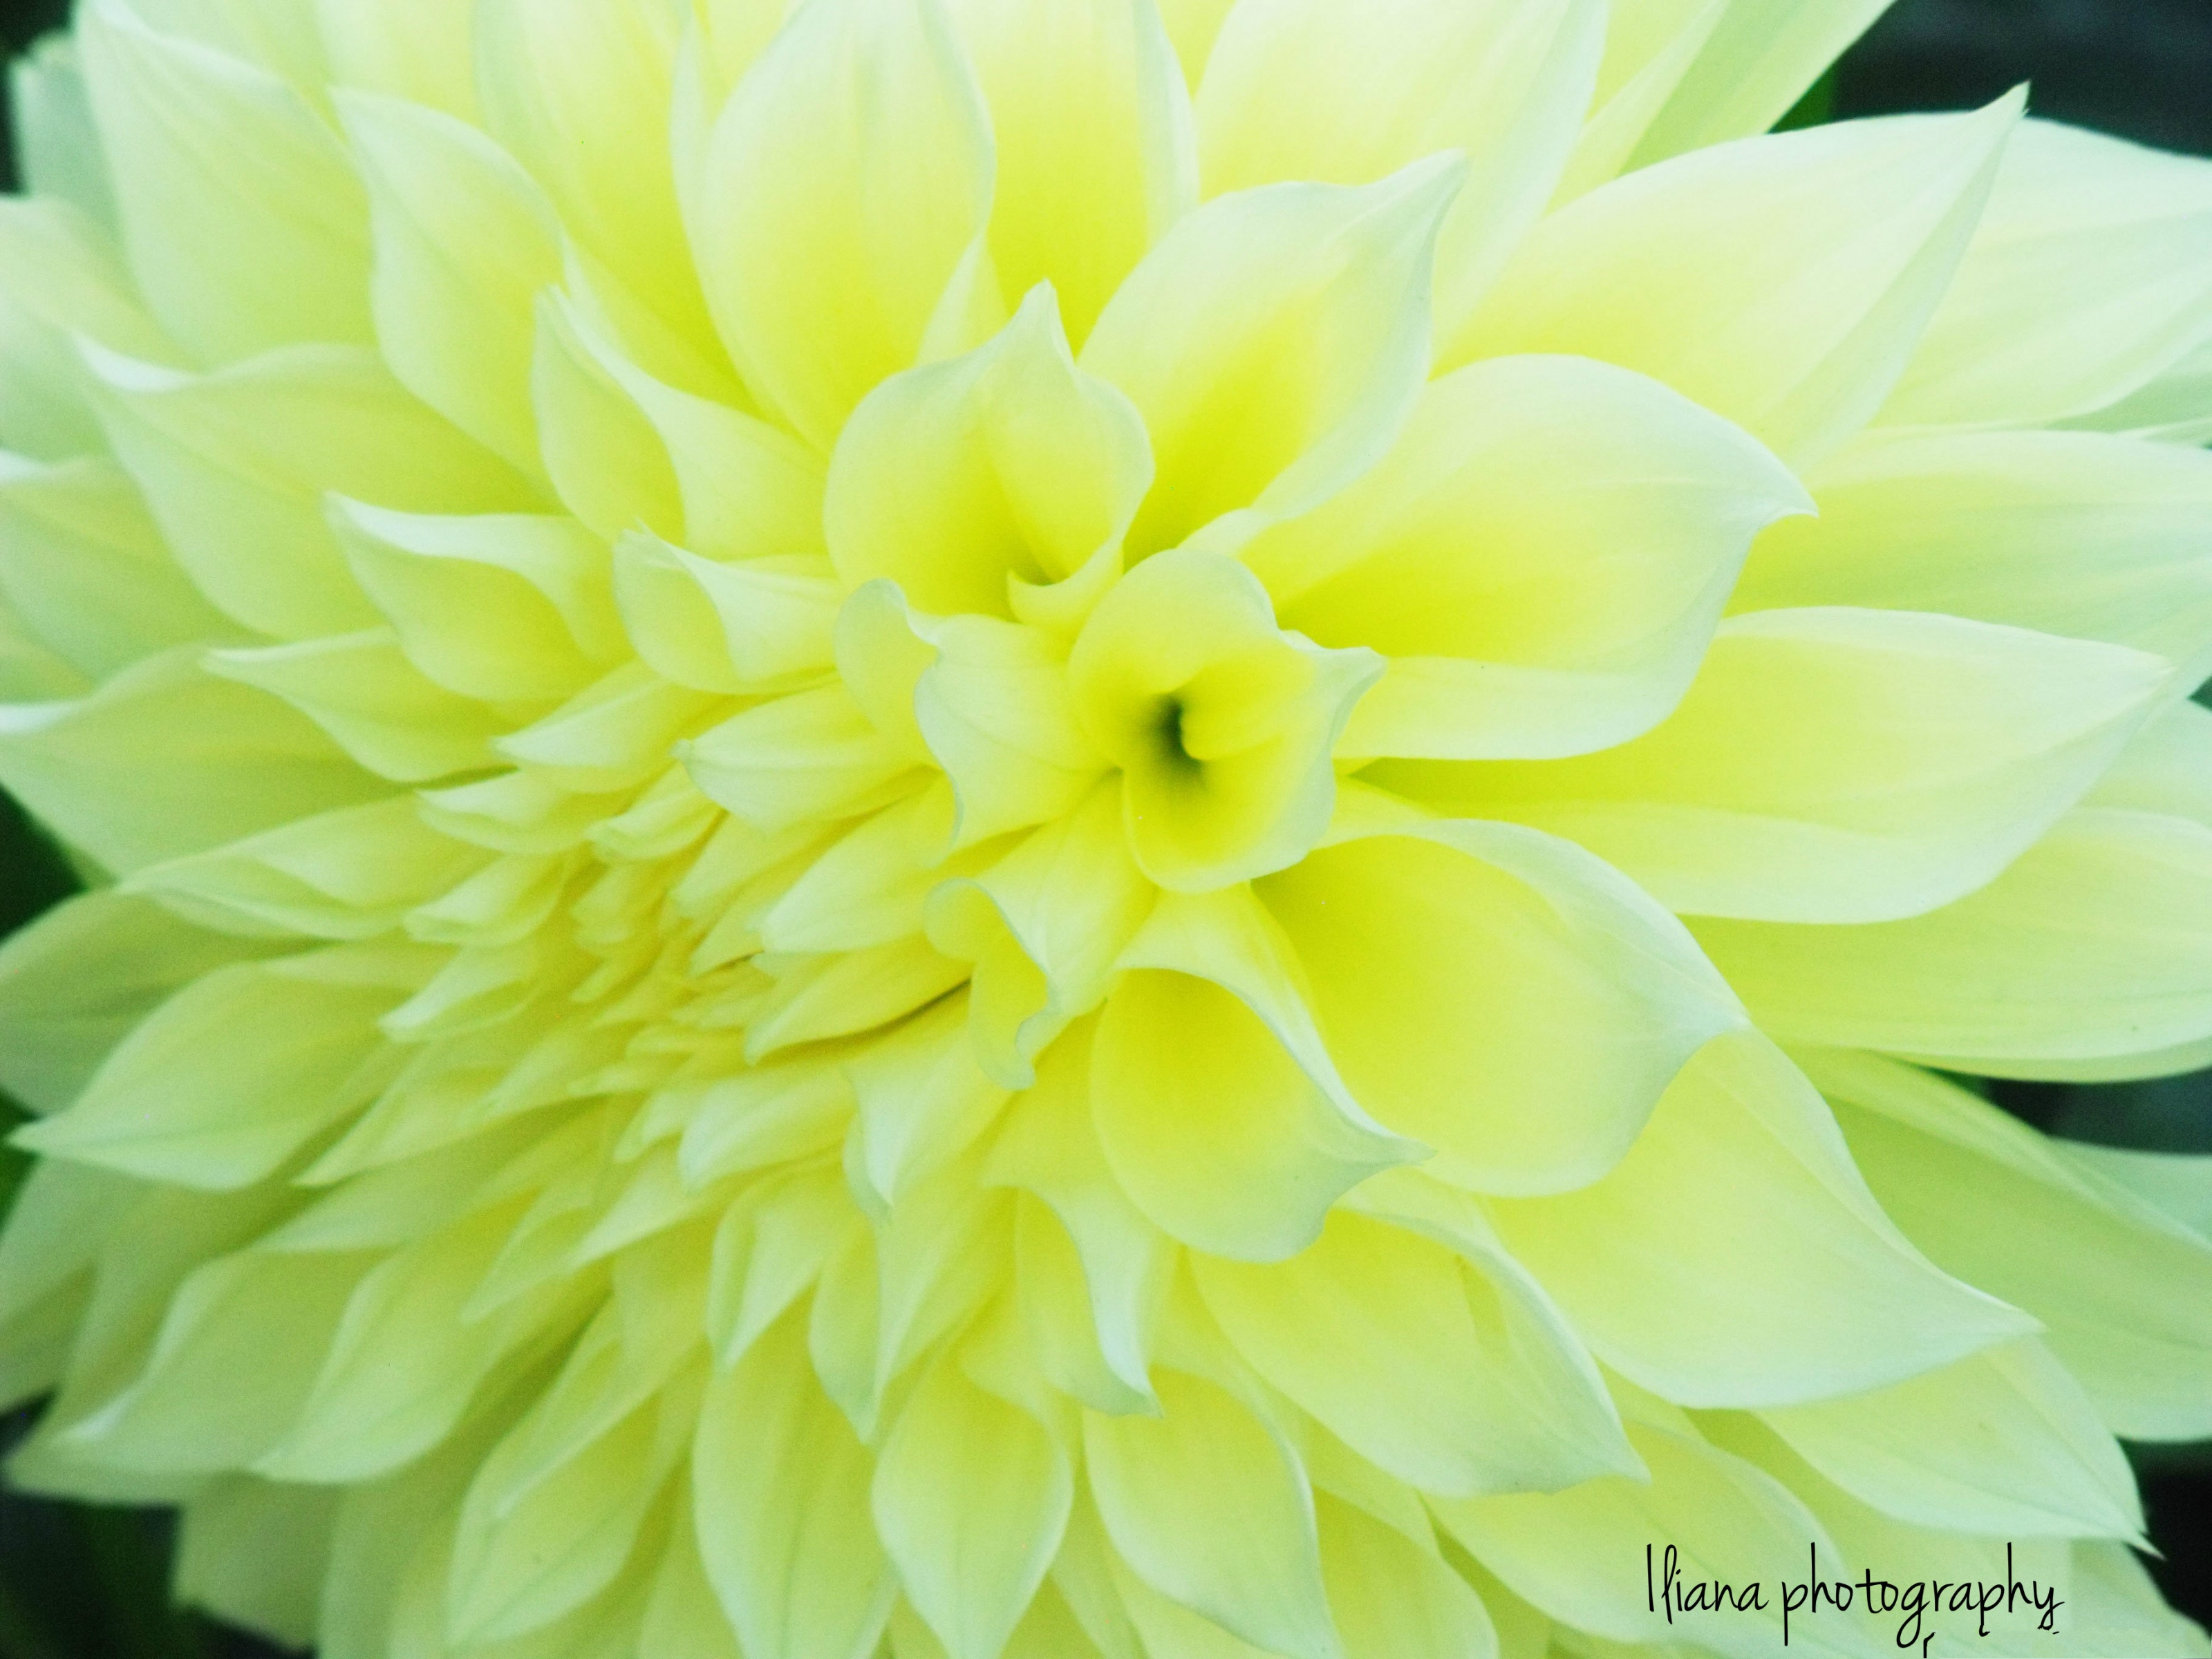 Light Yellow Flower on Black Background3200X2400 wallpaper 3200x2400